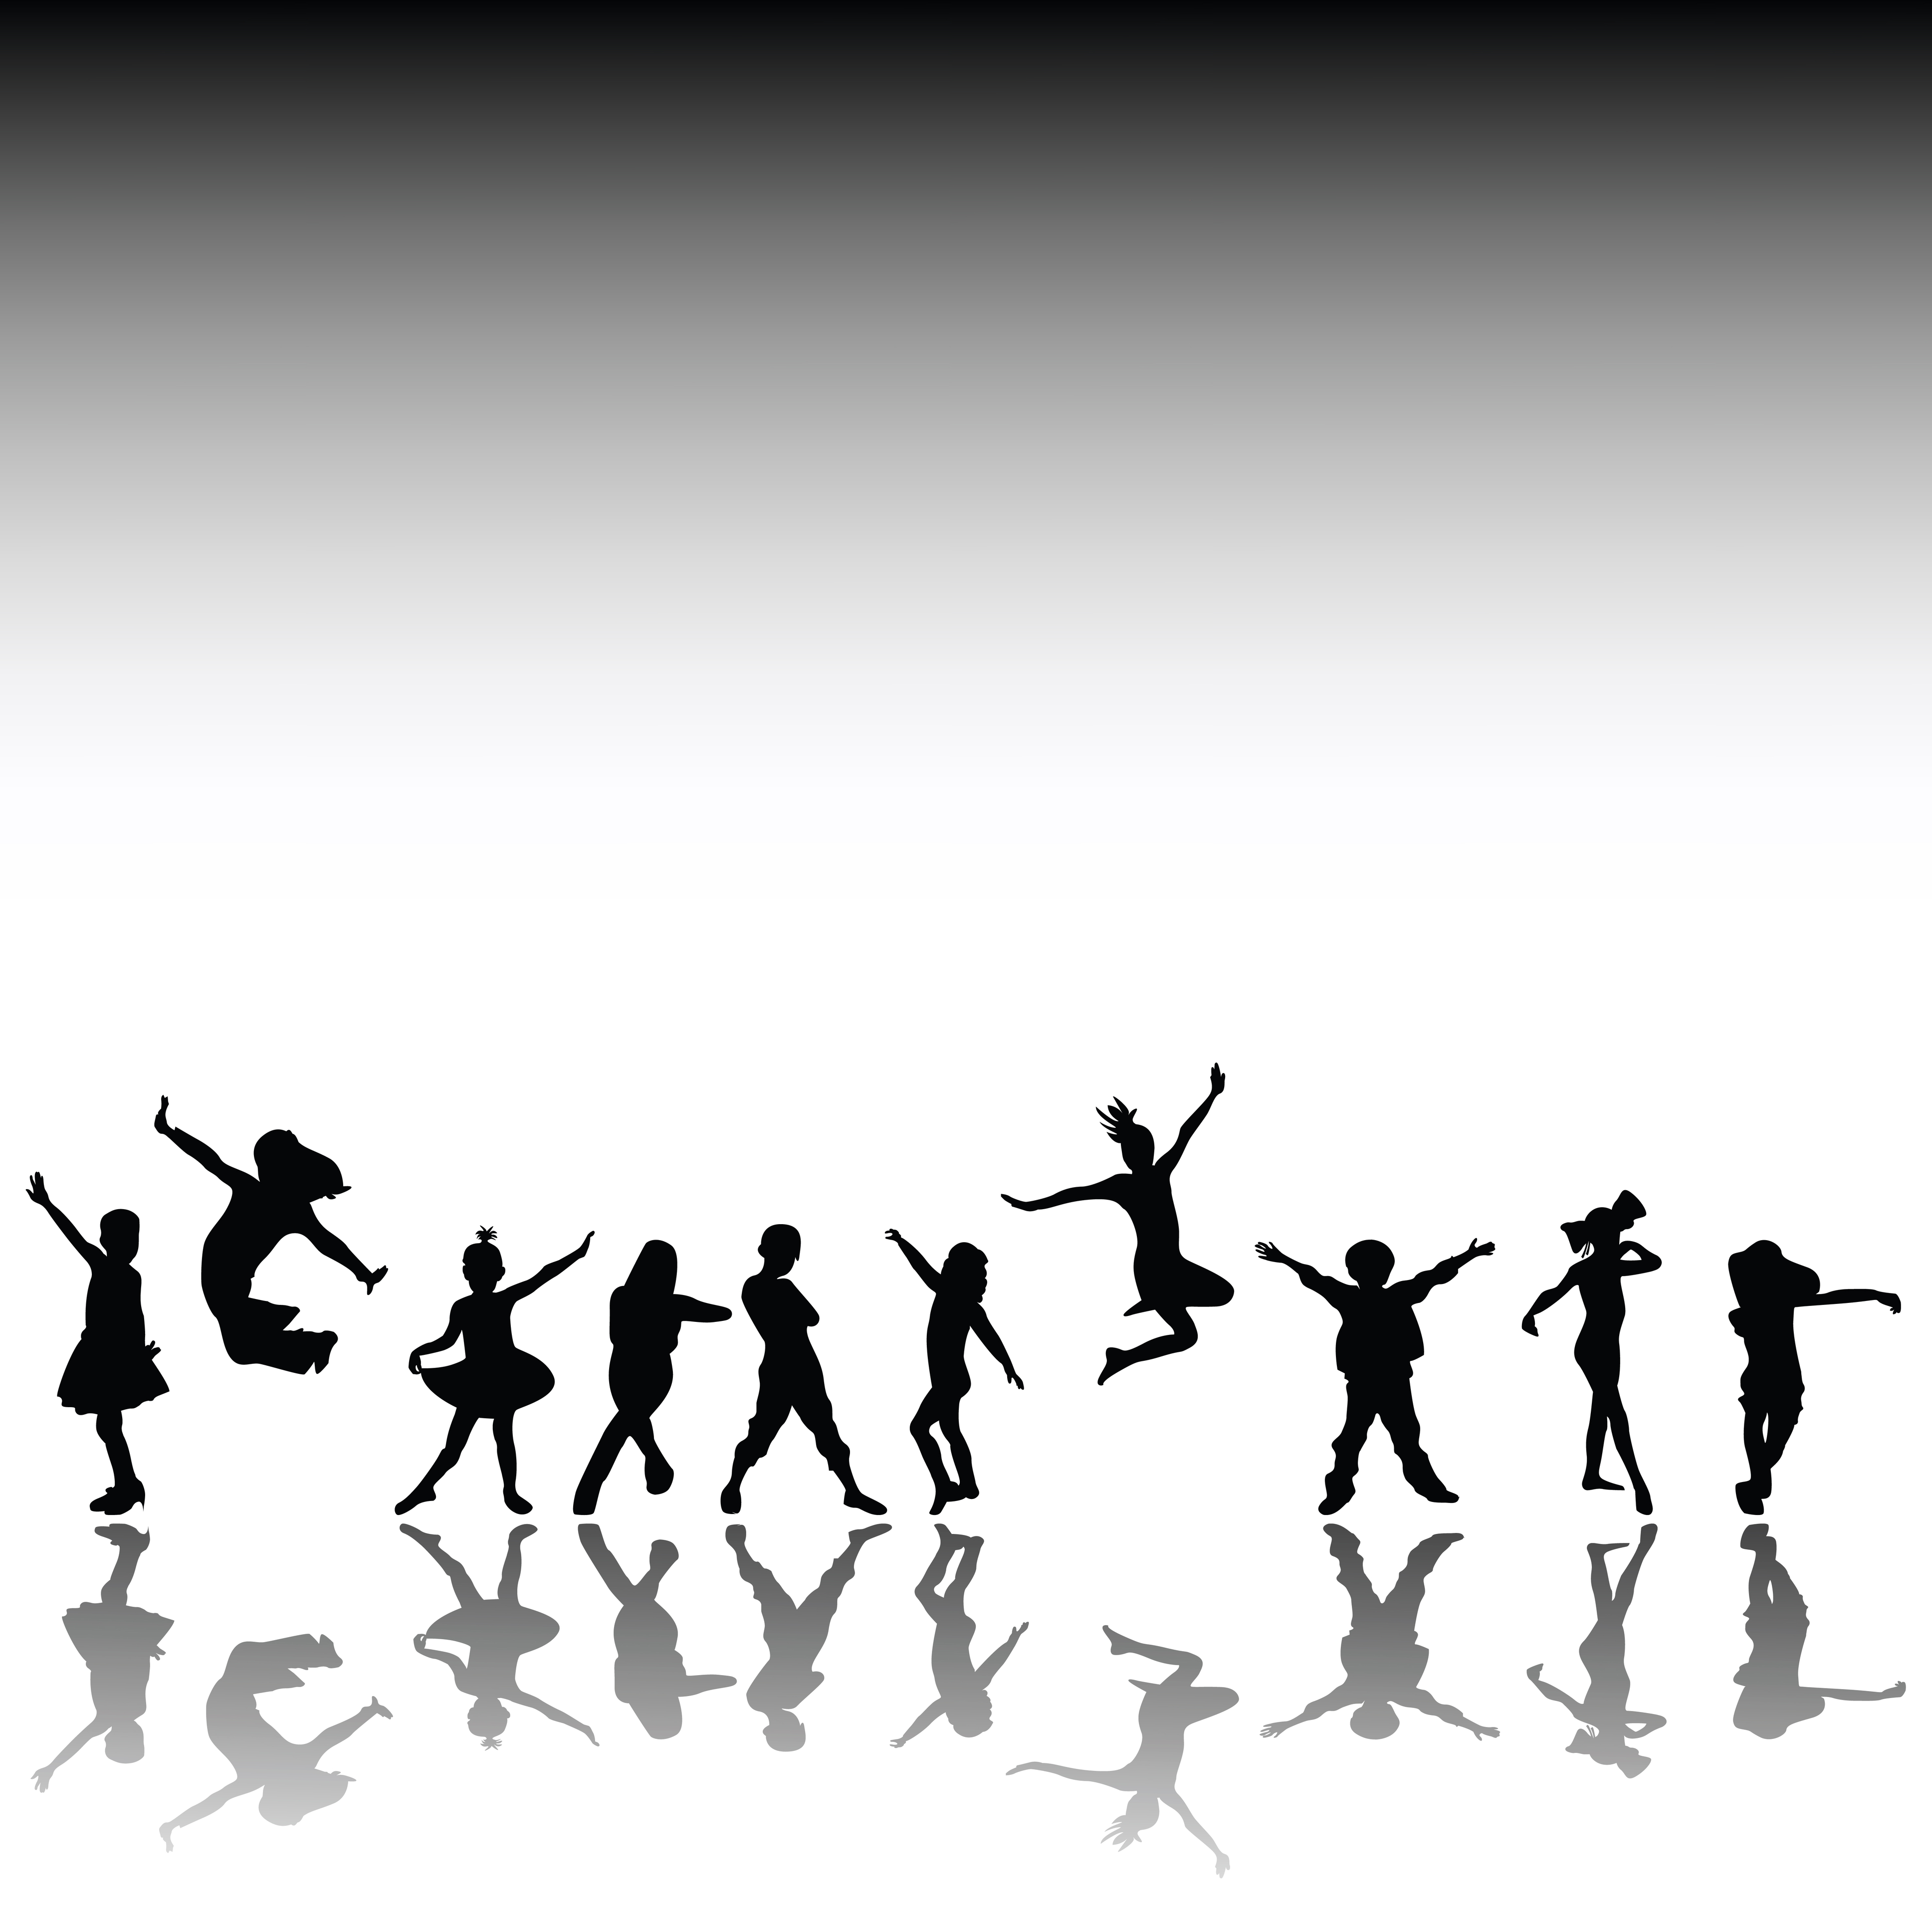 Dancing clipart dance crew, Dancing dance crew Transparent.